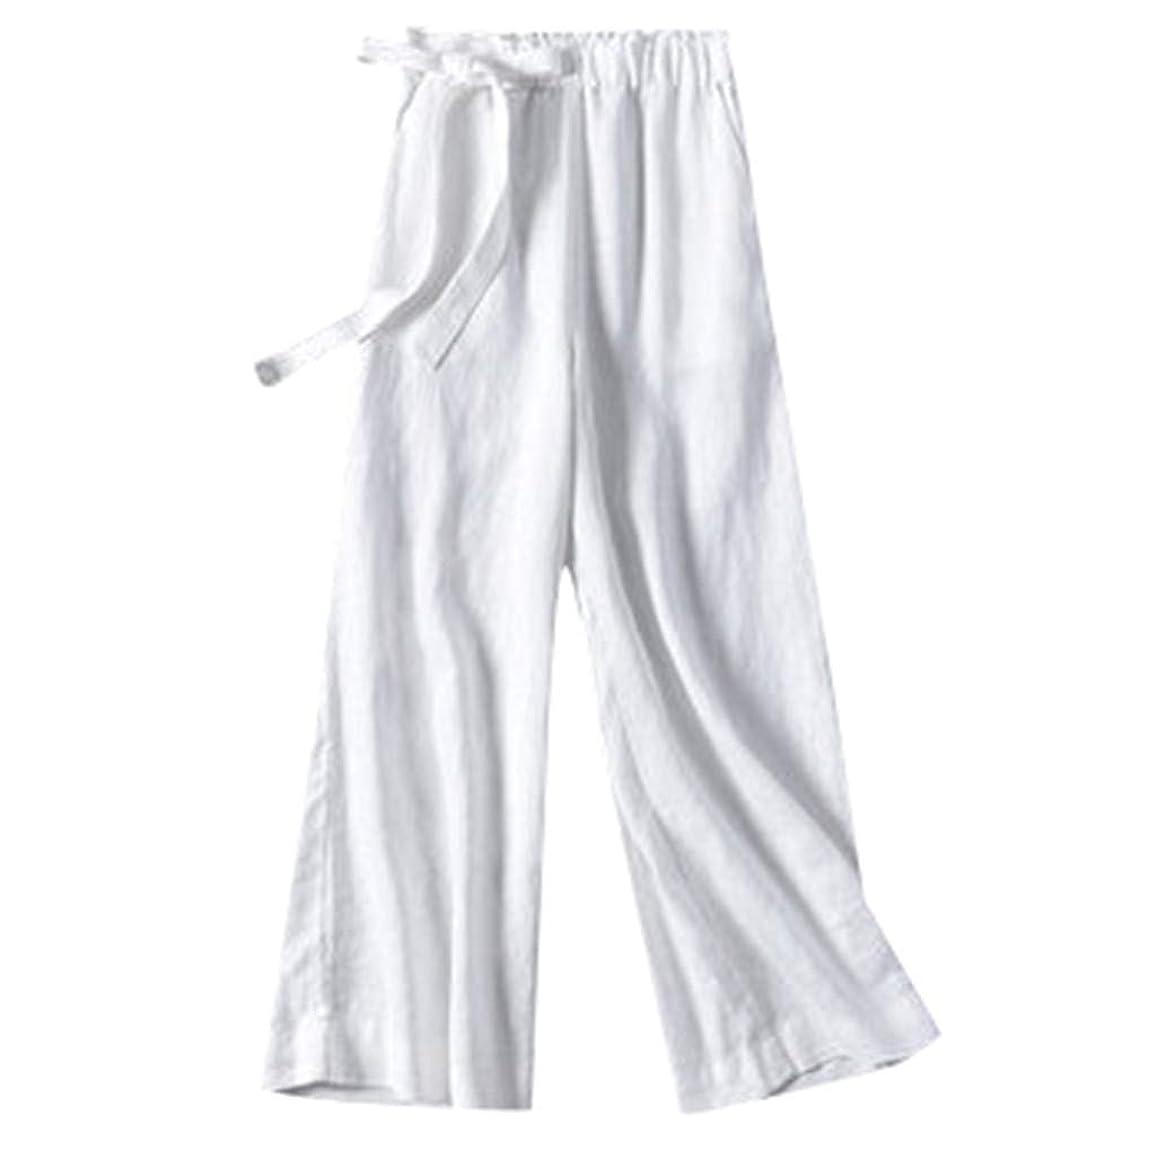 Women's Casual Pants Elastic Waist Cropped Trousers Bottoms Sports Wear Pants